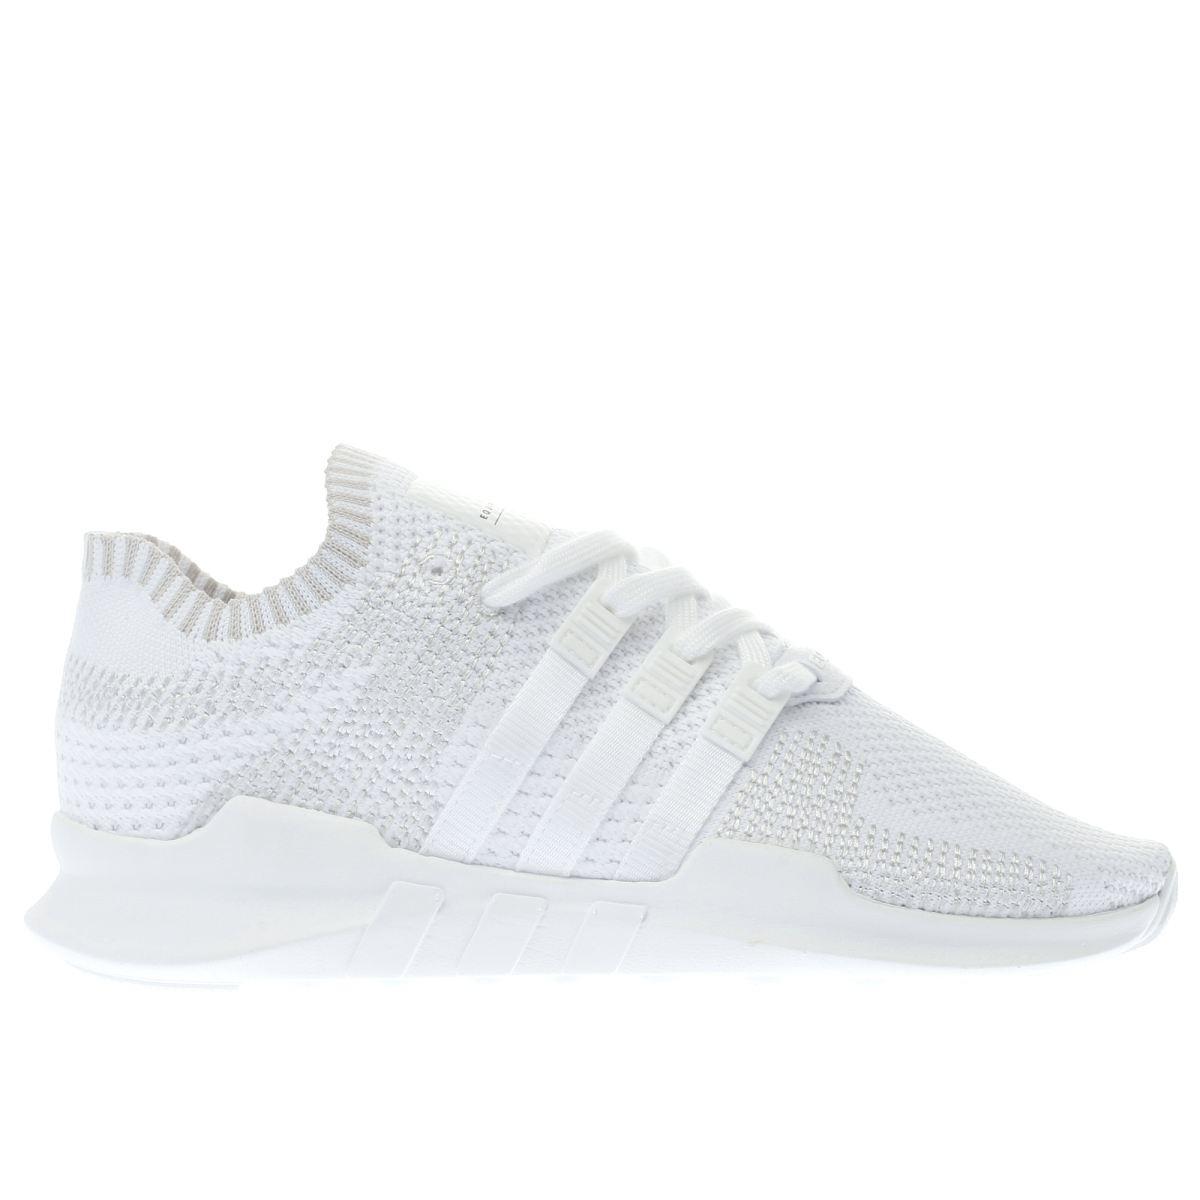 adidas white eqt support adv primeknit trainers